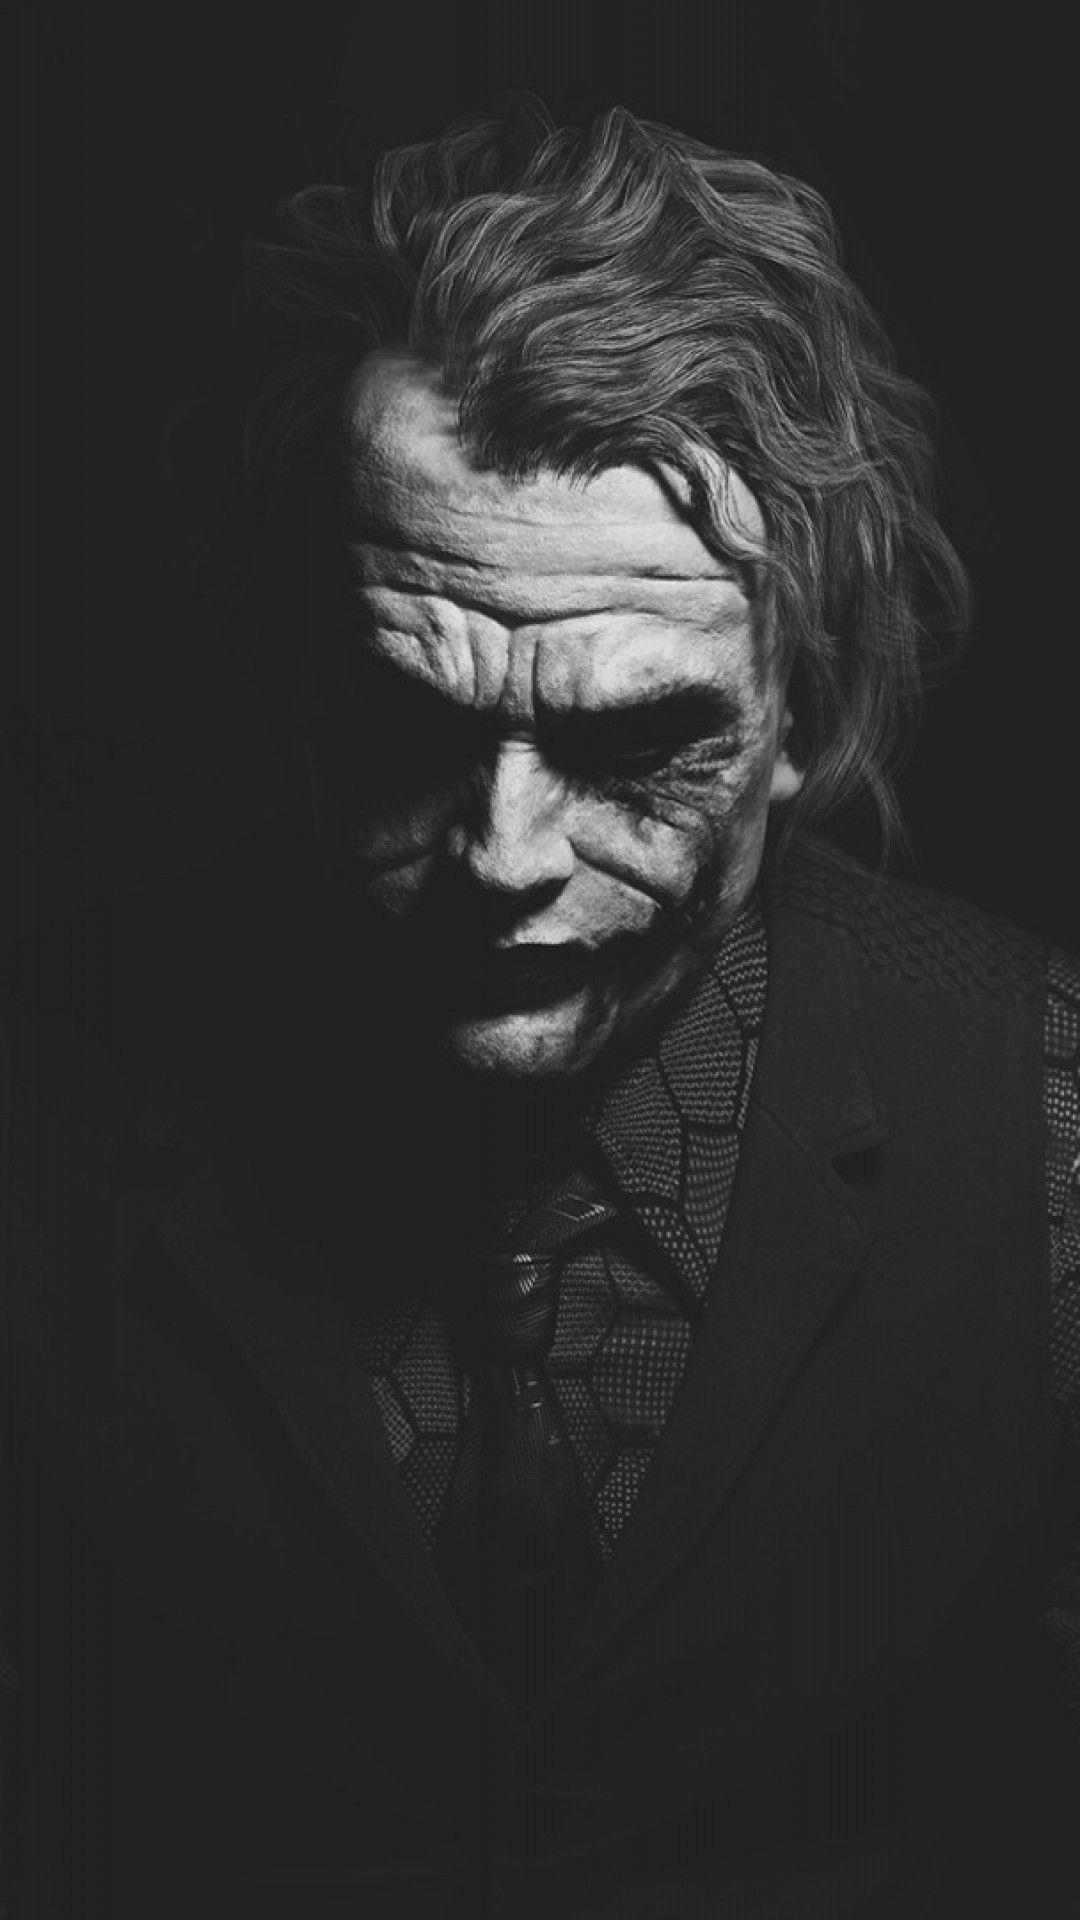 Free Download Heath Ledger Joker Wallpaper Hd 1080x1920